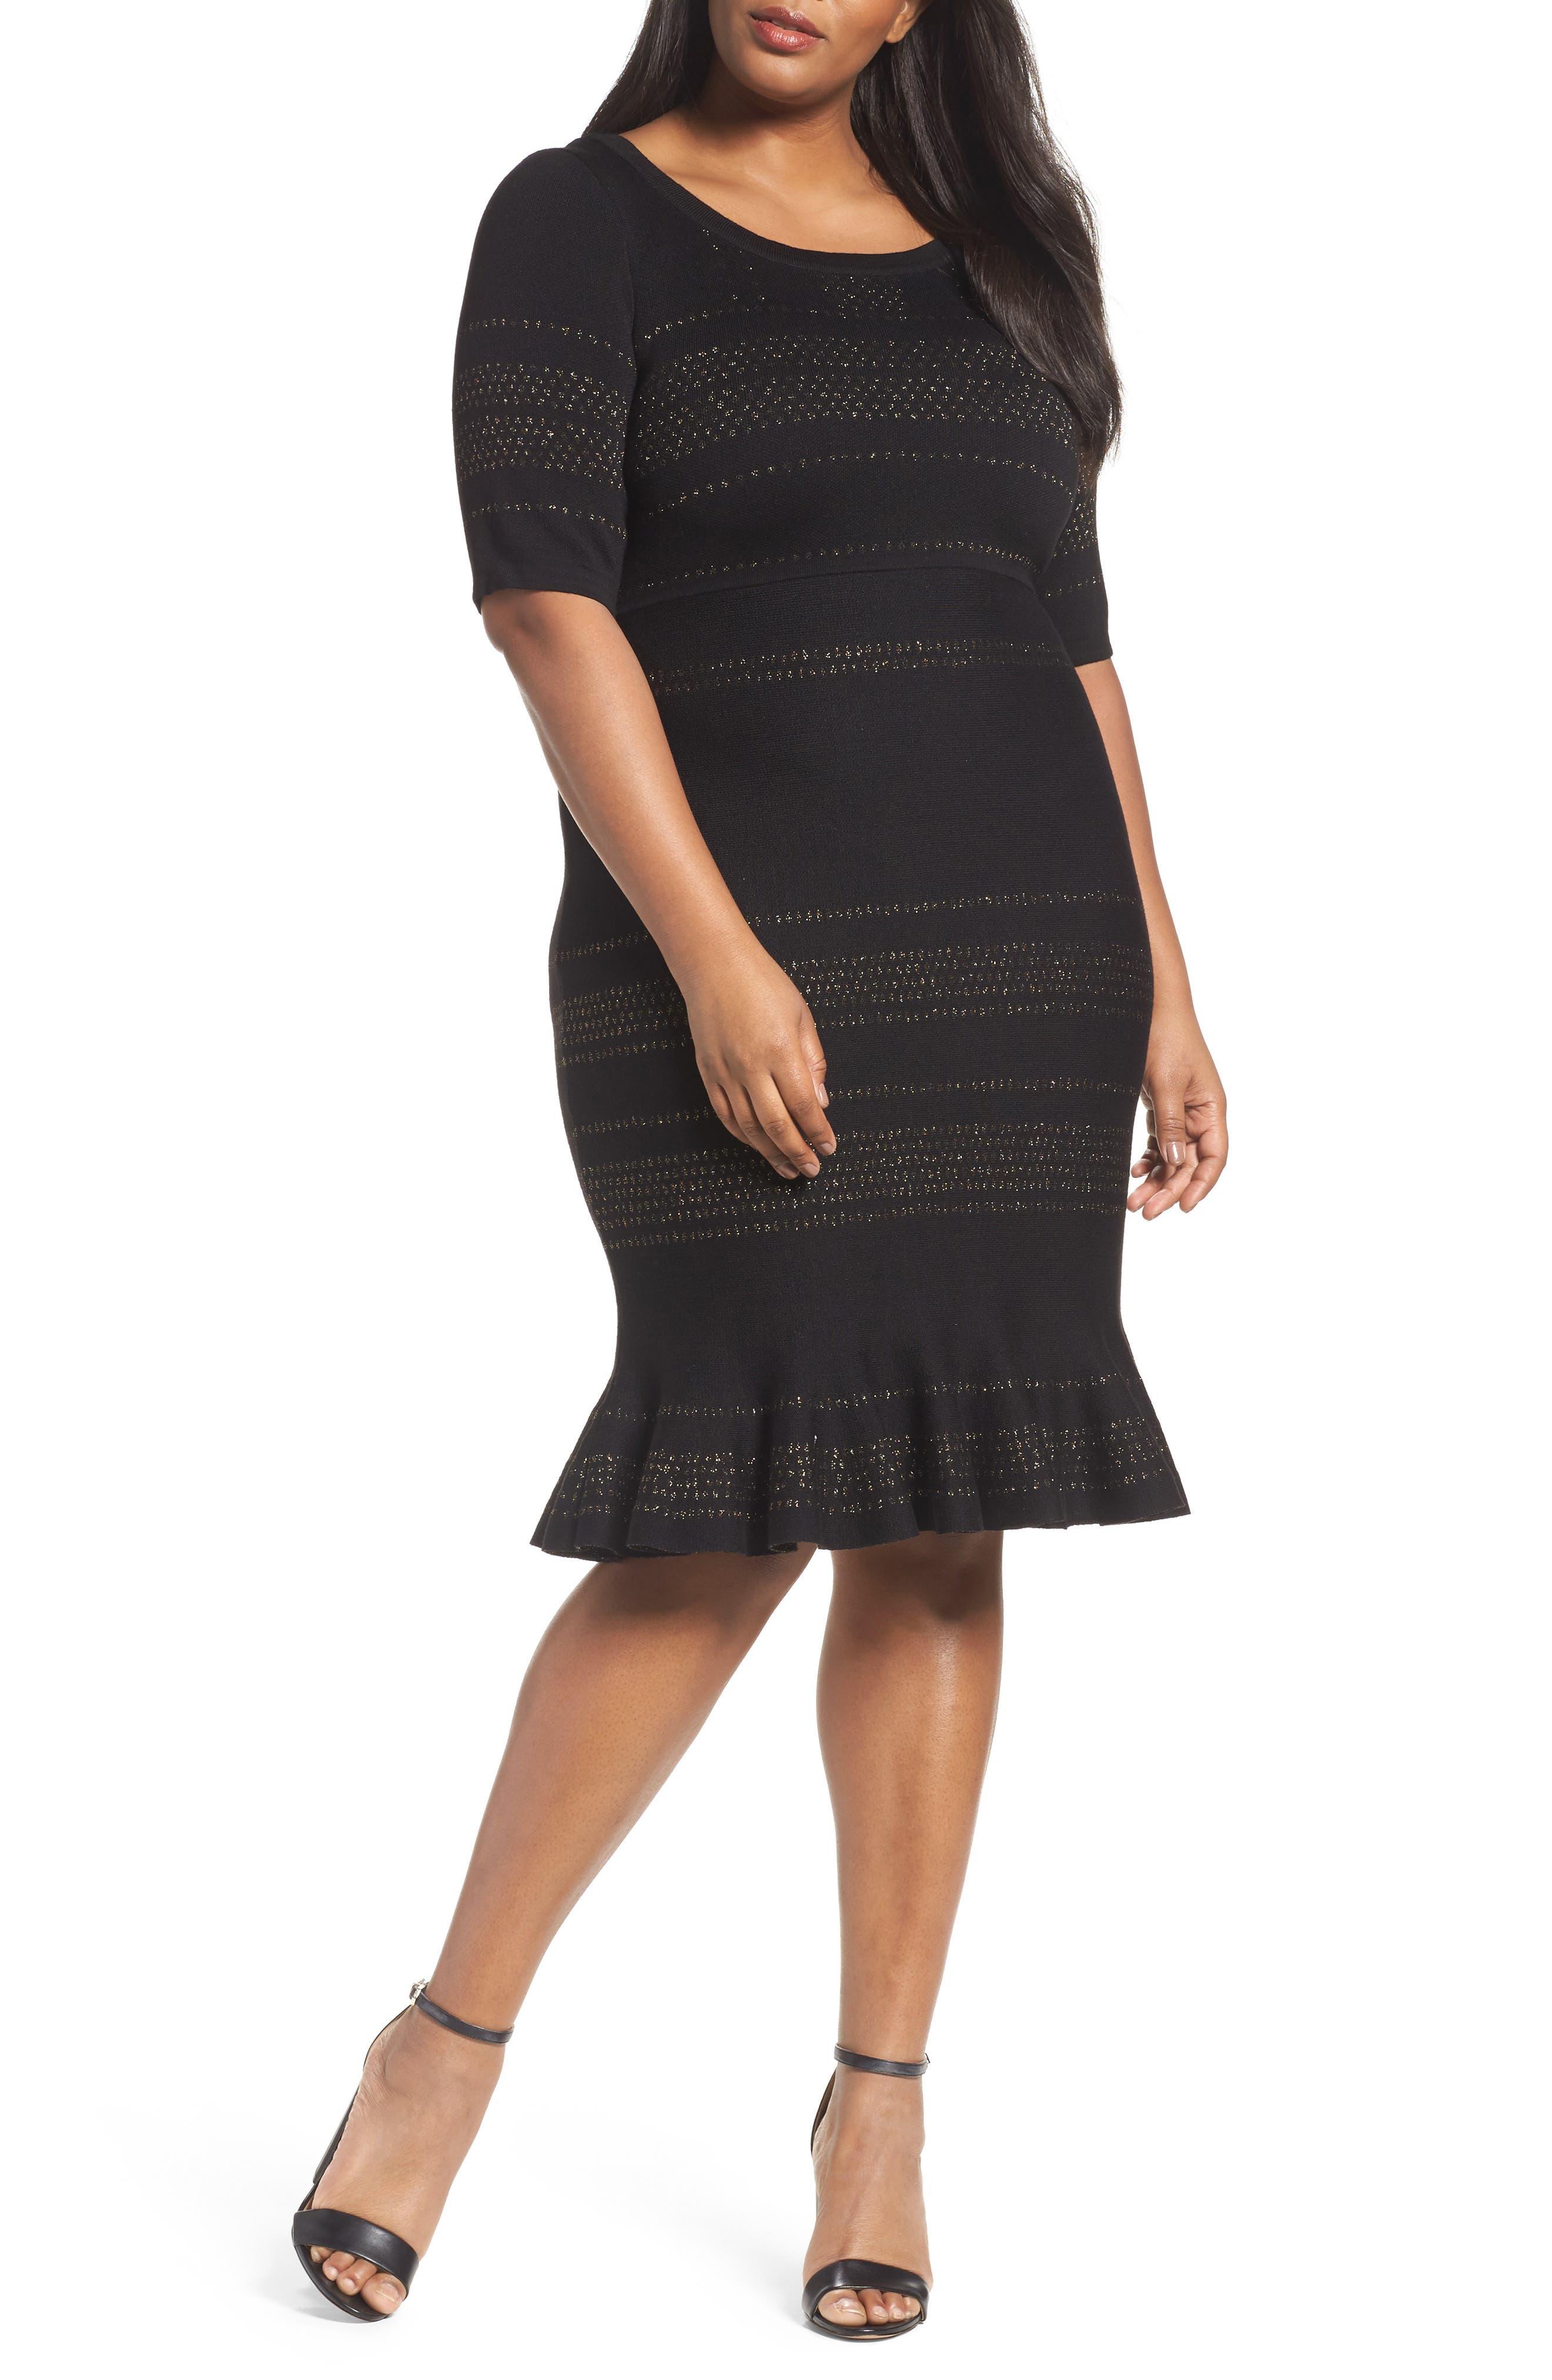 Alternate Image 1 Selected - Taylor Dresses Metallic Knit Dress (Plus Size)